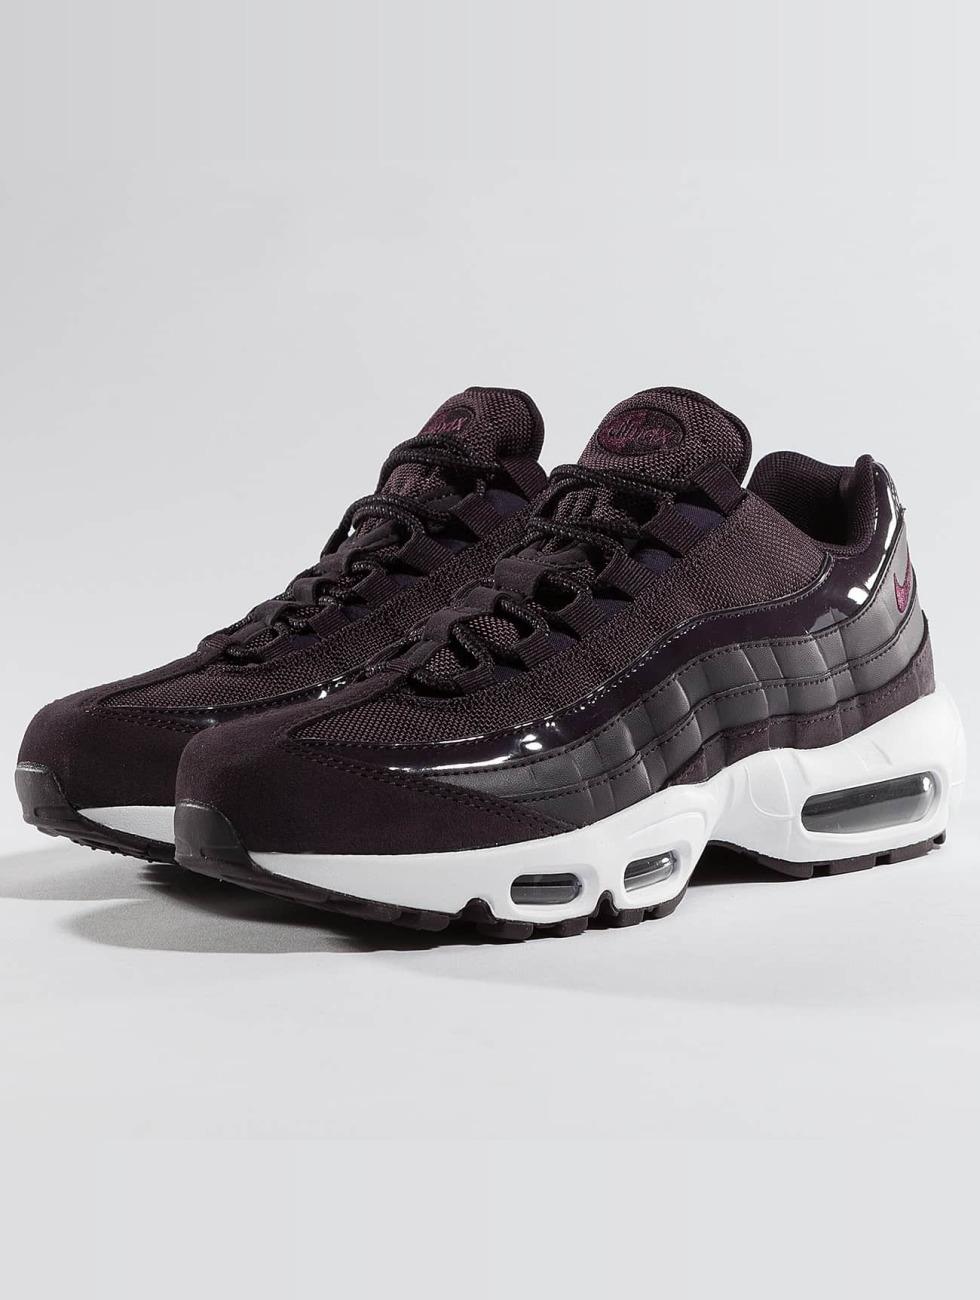 Nike schoen / sneaker Air Max 95 in rood 376337 Korting Verhandelbare zCgUMhK